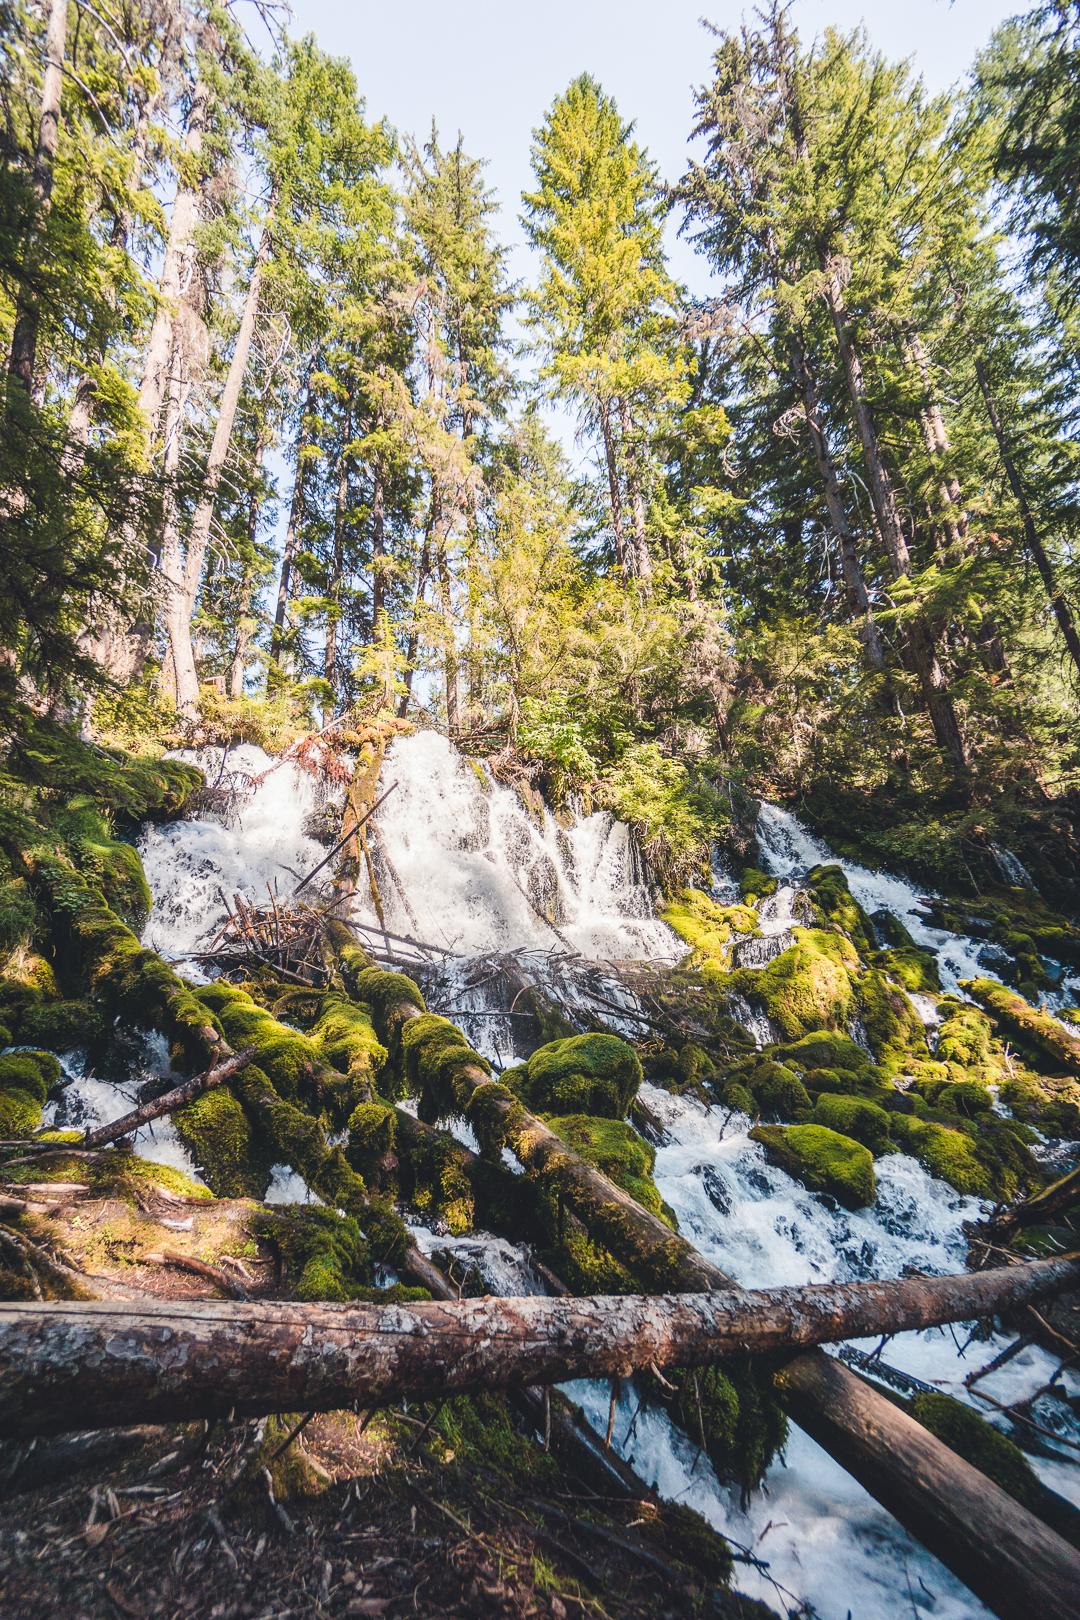 Clearwater Falls in Umpqua National Forest